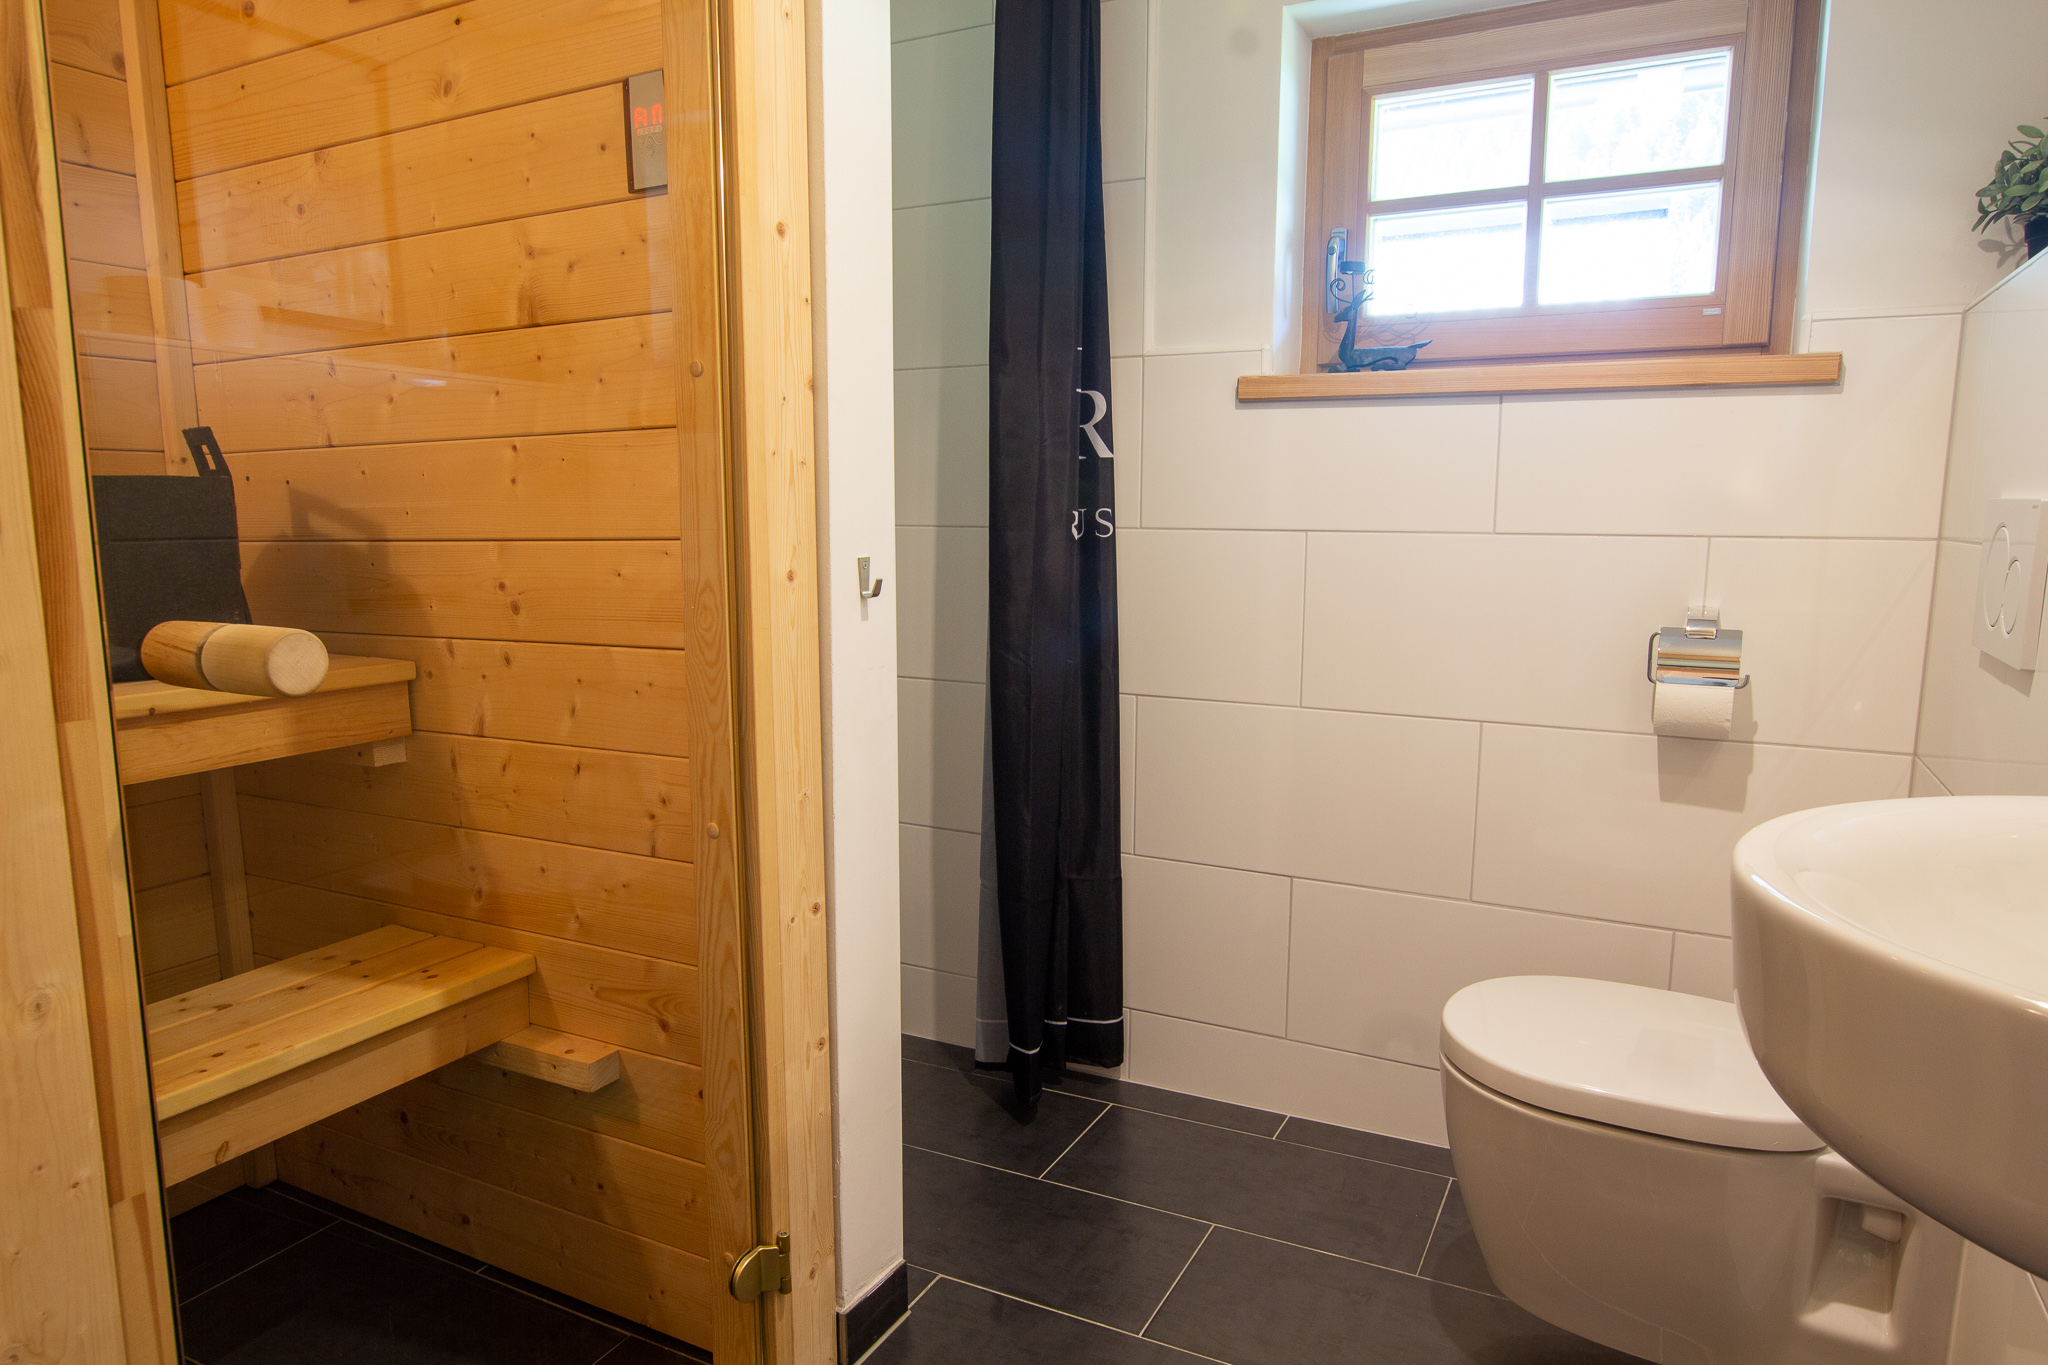 Maison de vacances Lodge Seeblick am Skilift und Bergsee für 5 (2636751), Uttendorf, Pinzgau, Salzbourg, Autriche, image 13